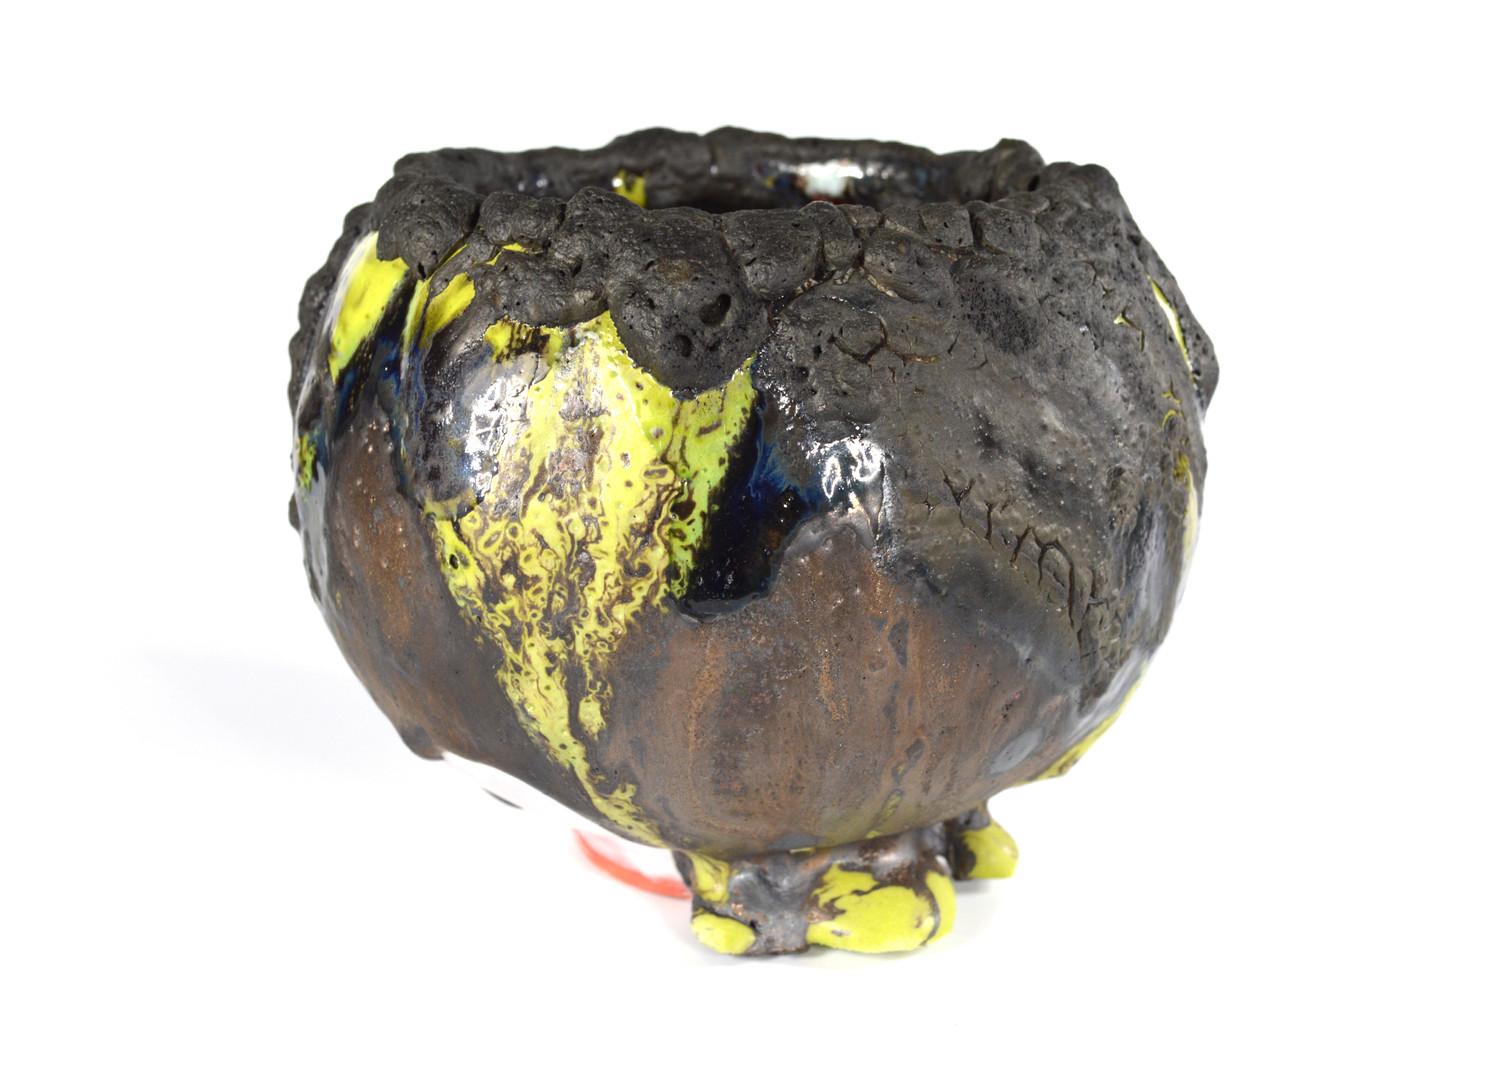 Pam-Space-Dog-Moon-Jar-Gold-Green-2-Back